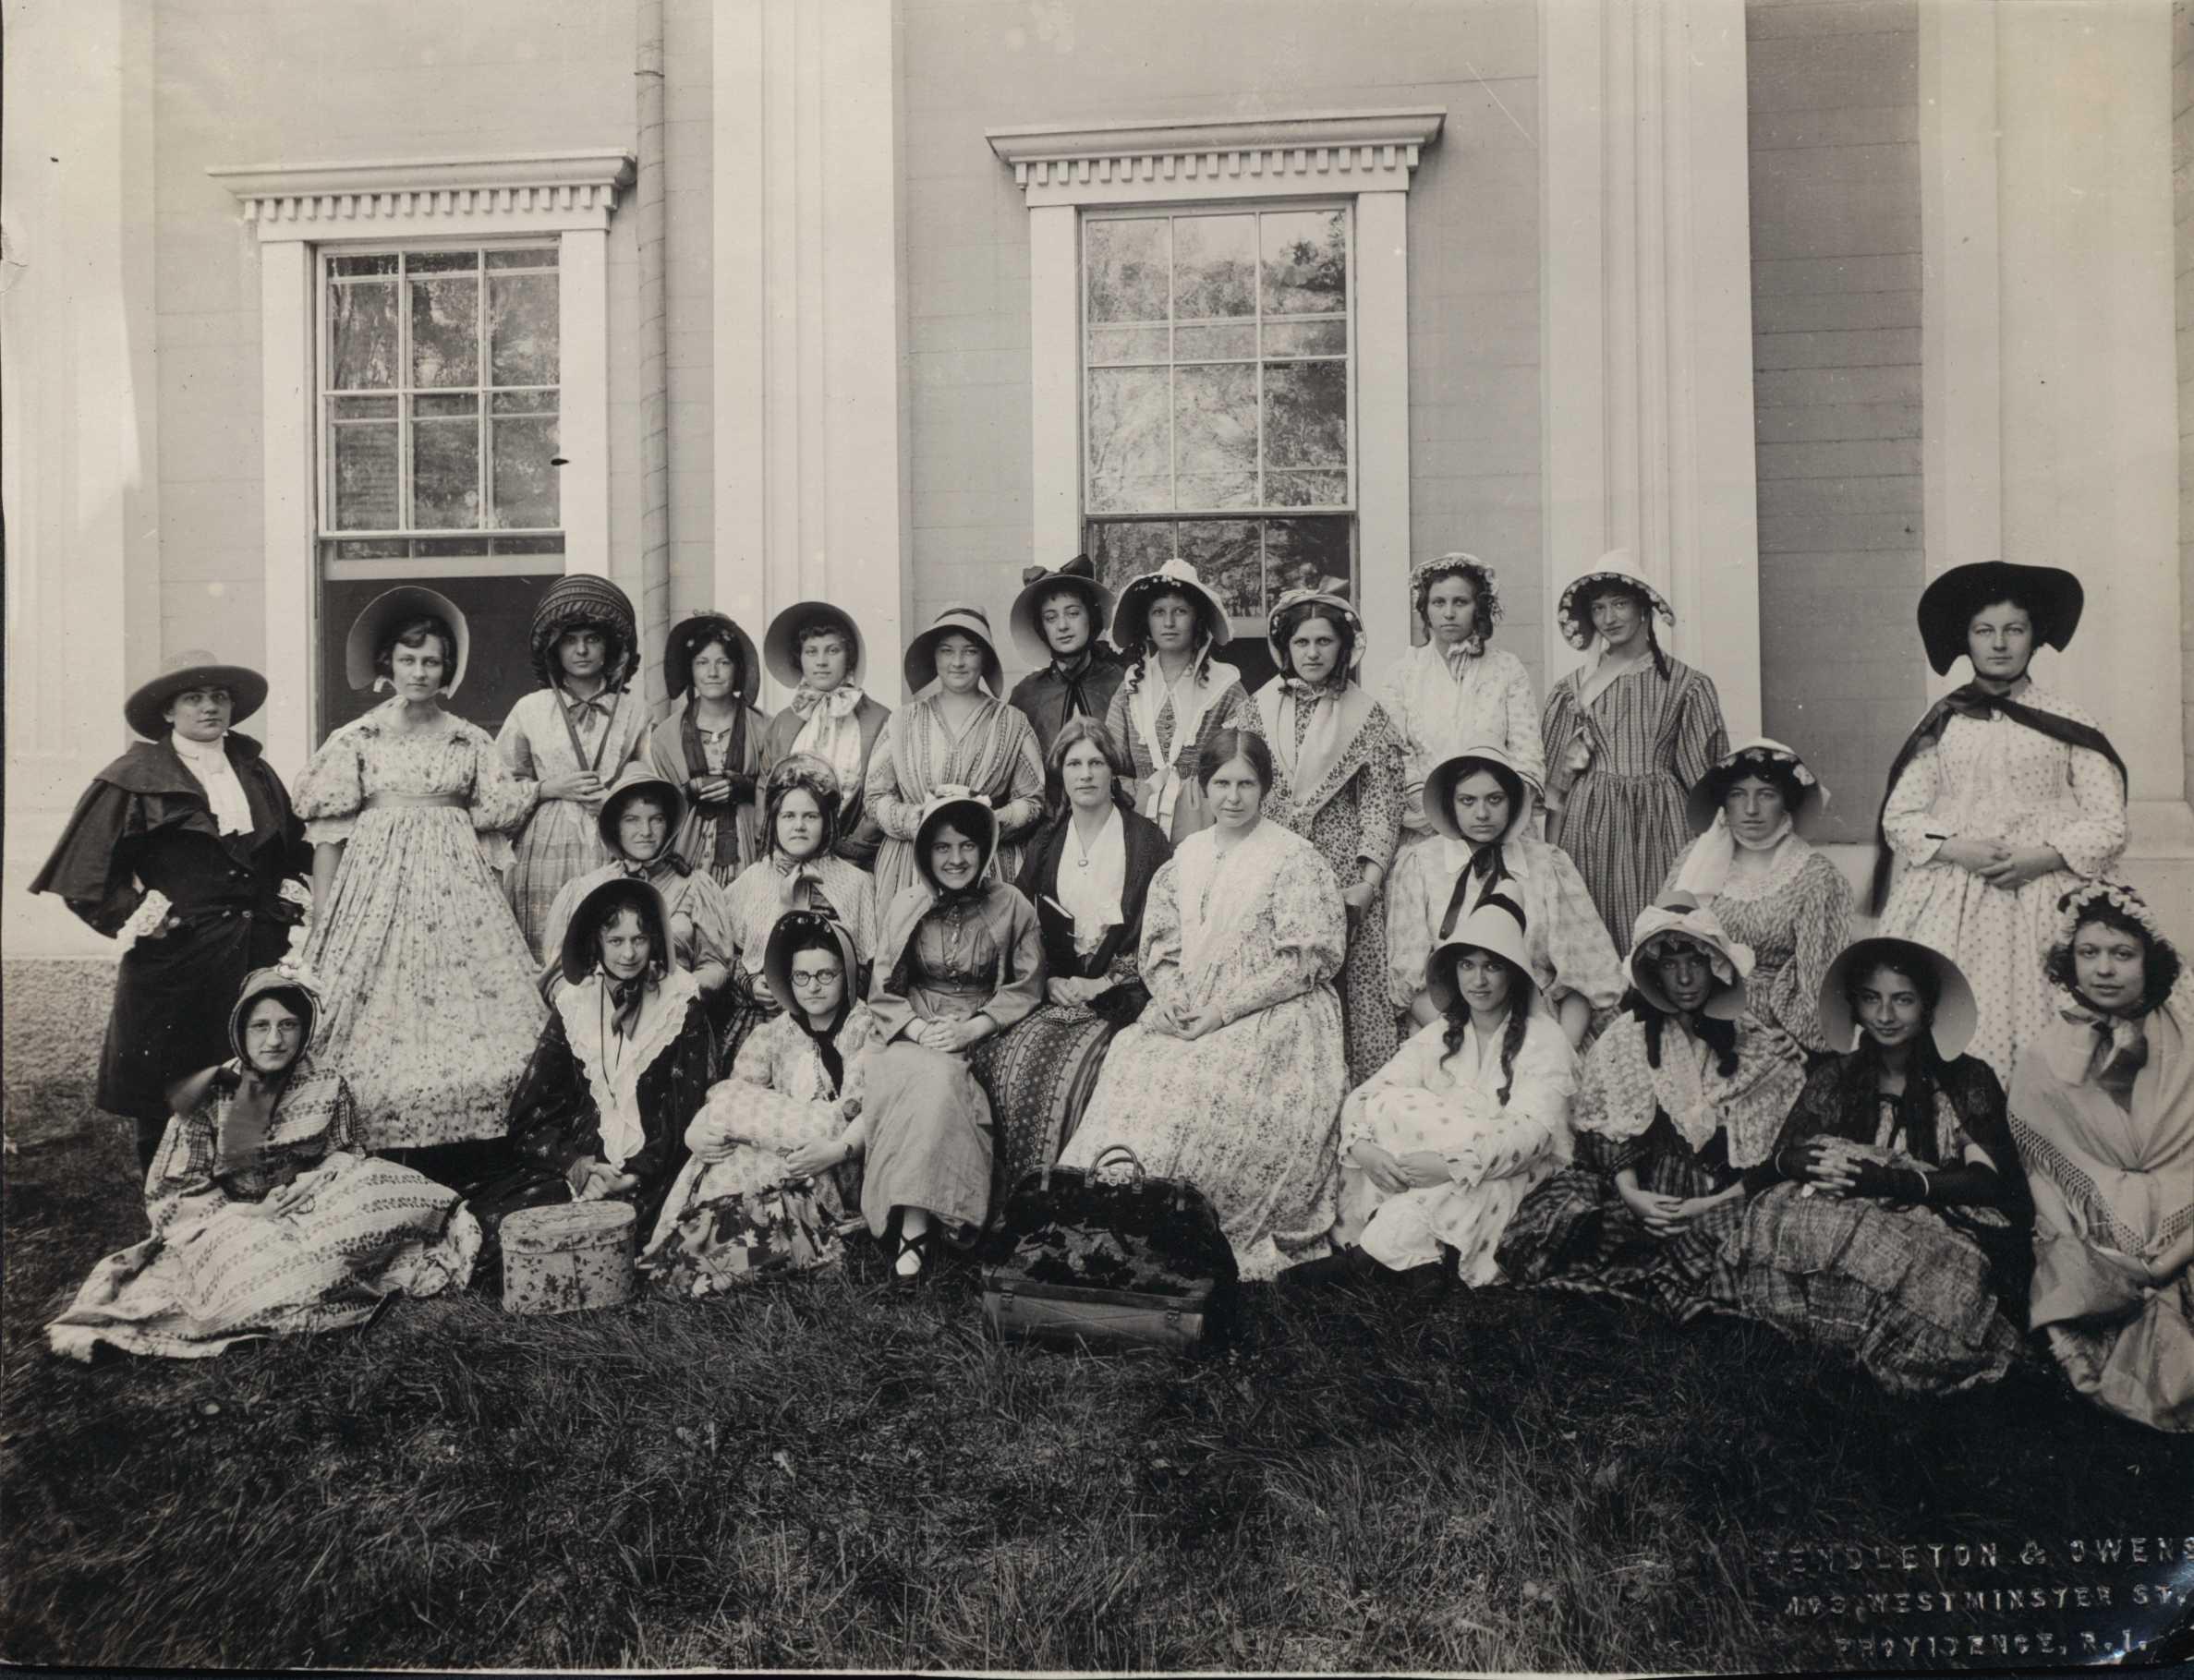 May Day Celebration at Wheaton, 1920